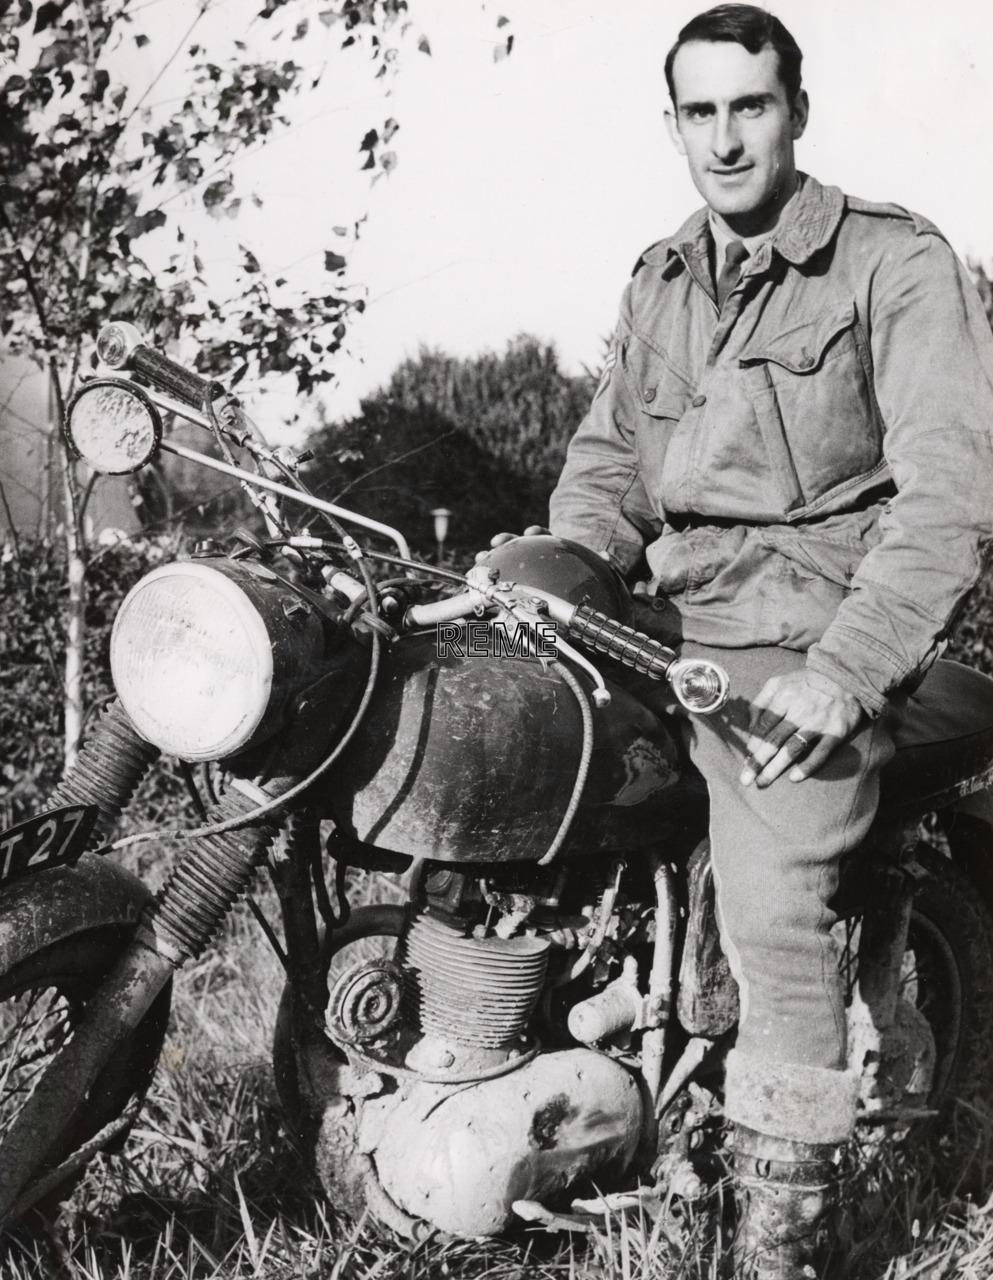 Staff Sergeant NCH Barnard, BAOR (British Army of the Rhine), Motor Cycle Champion, 1970.